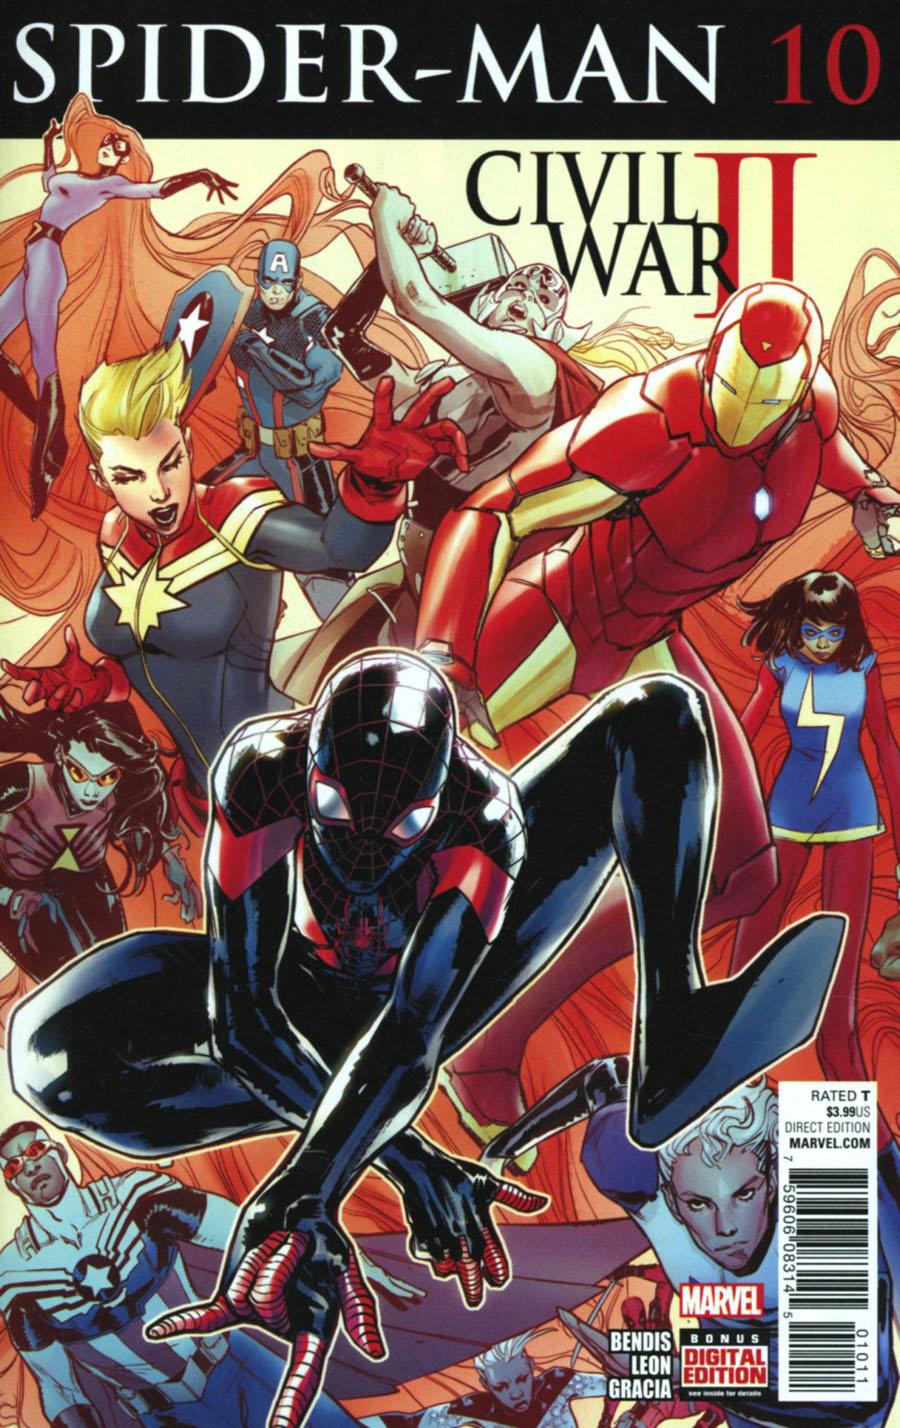 Spider-Man Vol 2 #10 Cover A Regular Sara Pichelli Cover